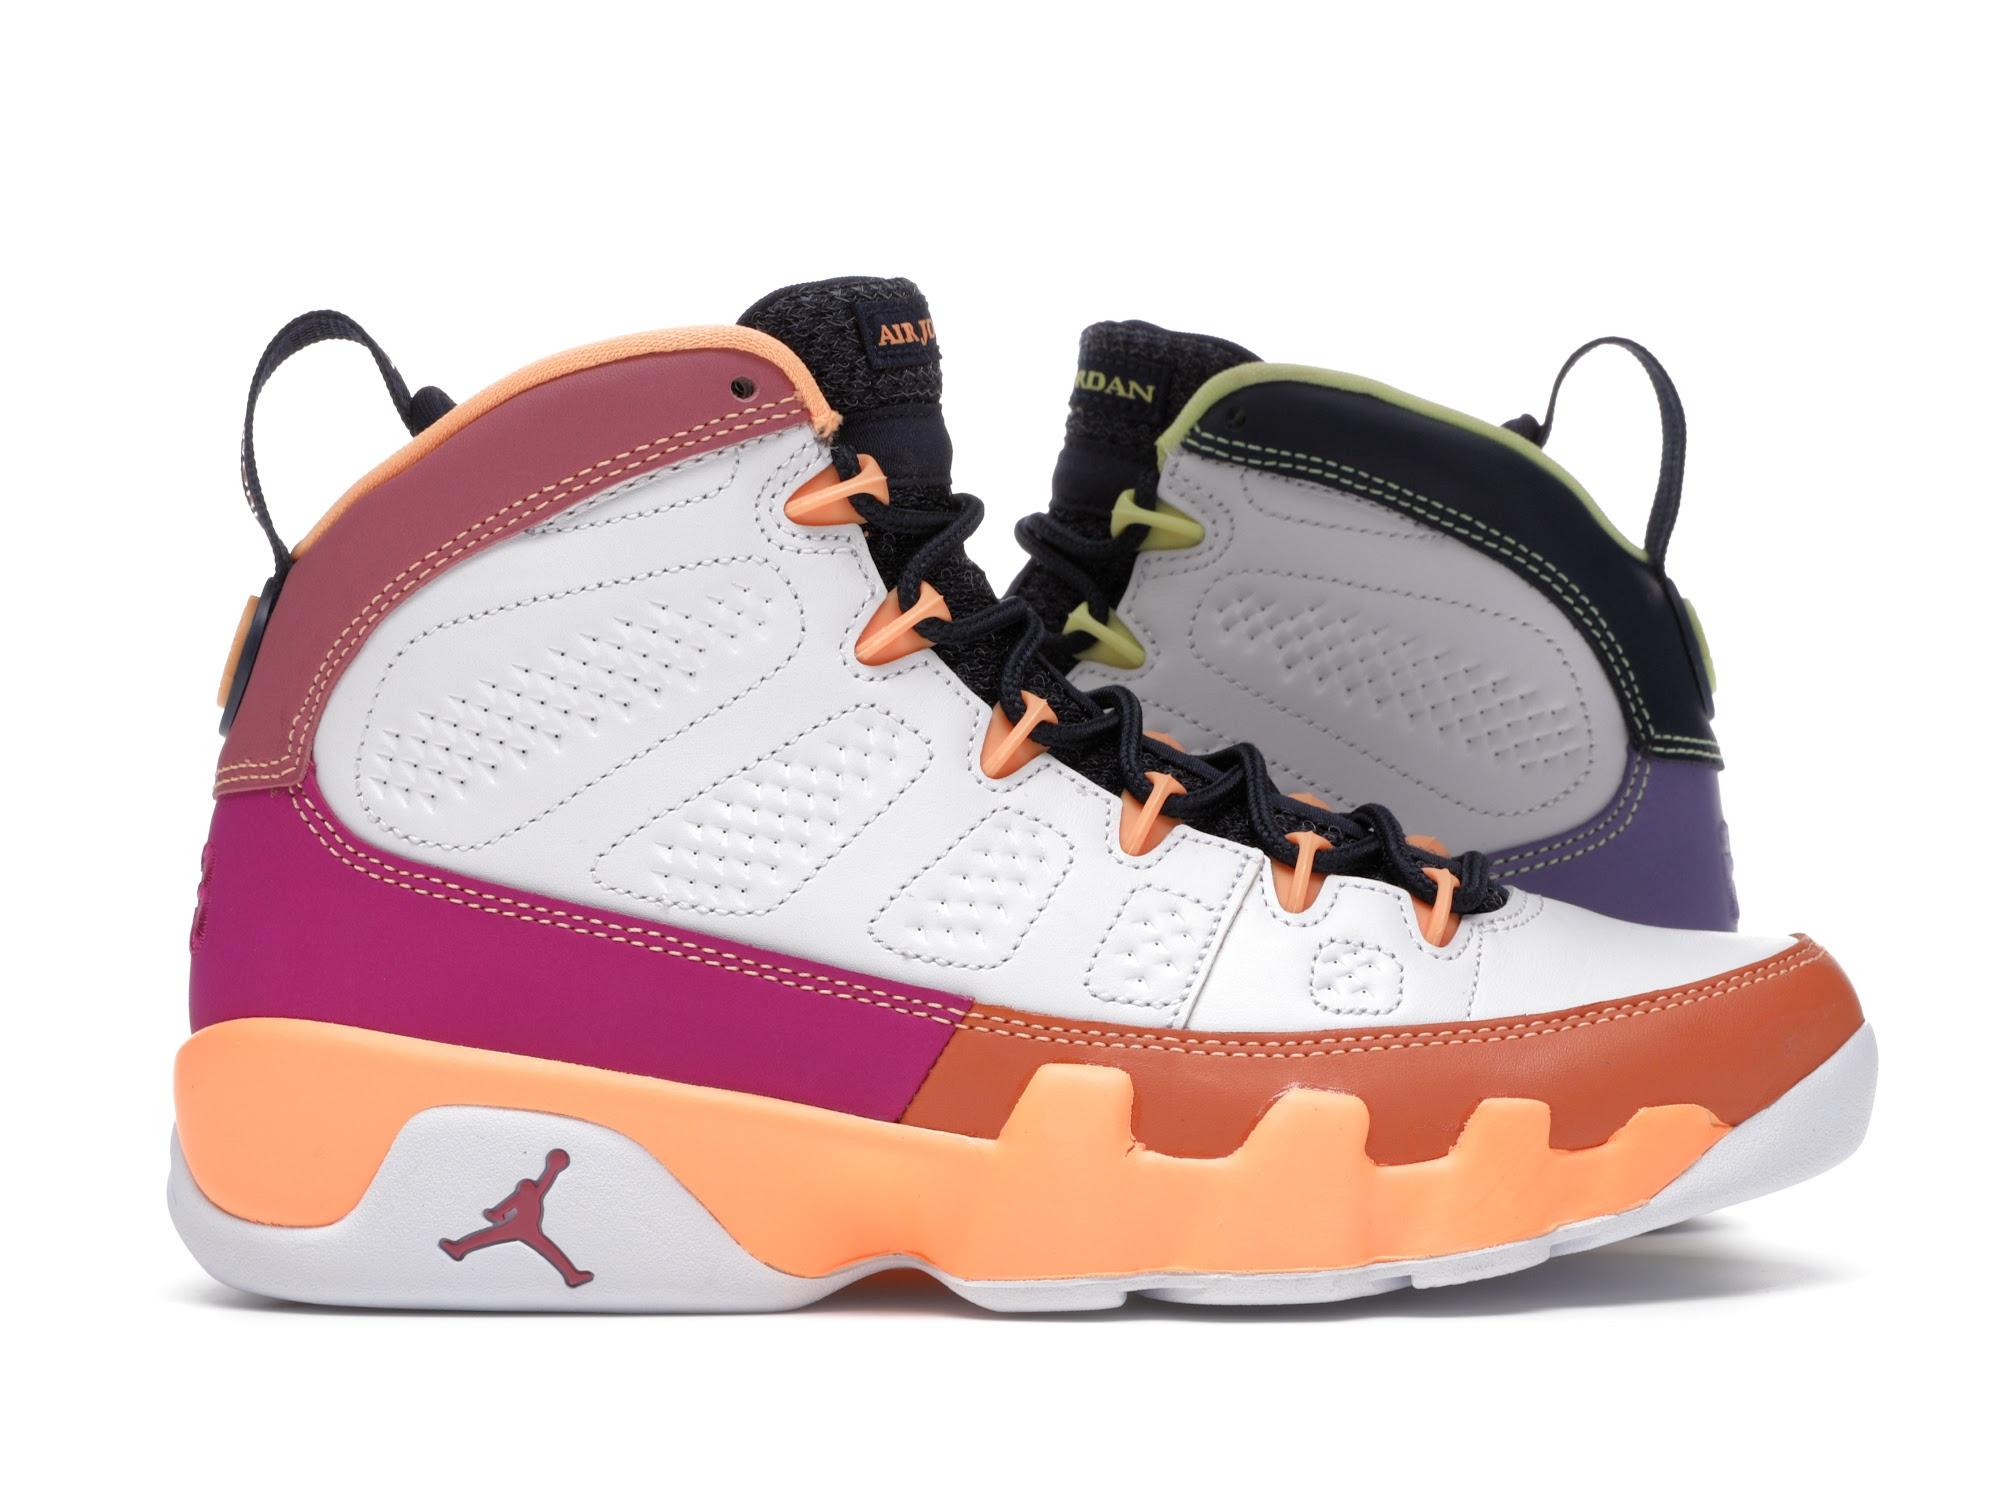 Jordan 9 Retro Change The World (W)